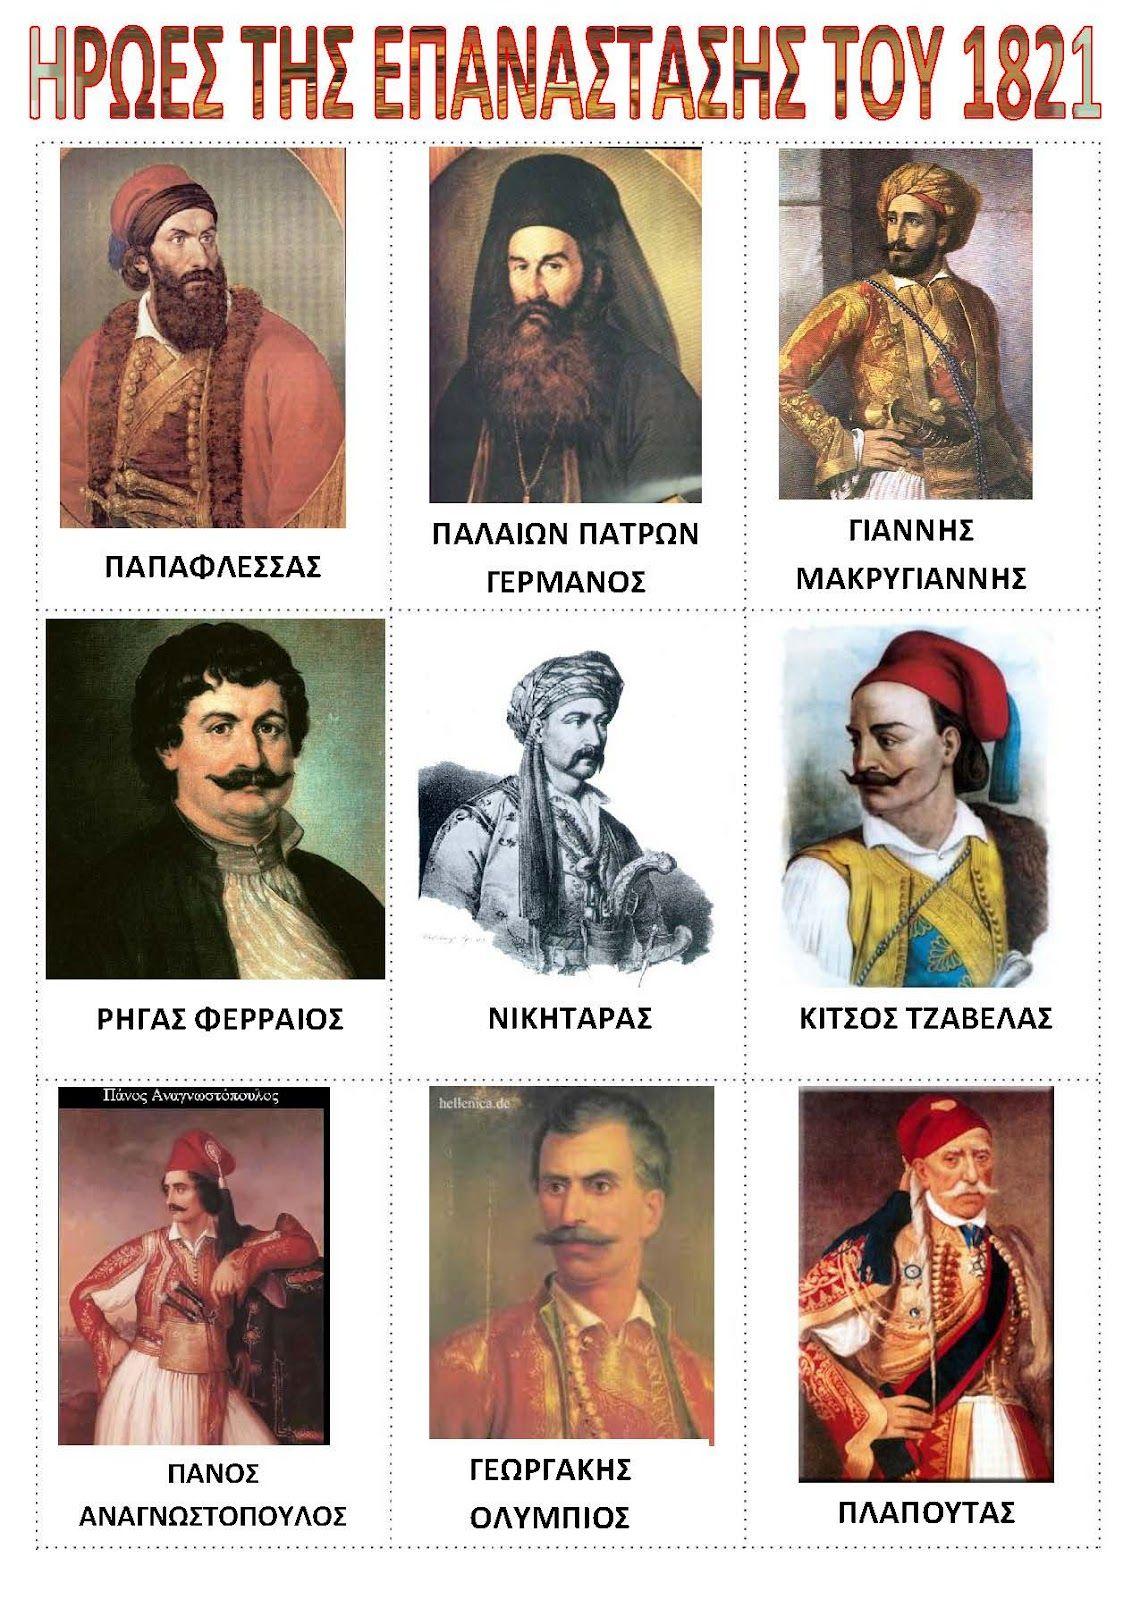 dreamskindergarten Το νηπιαγωγείο που ονειρεύομαι !: Οι ήρωες της Ελληνικής επανάστασης σε πίνακες αναφοράς Αρχαία Ελλάδα, Ελλάδα